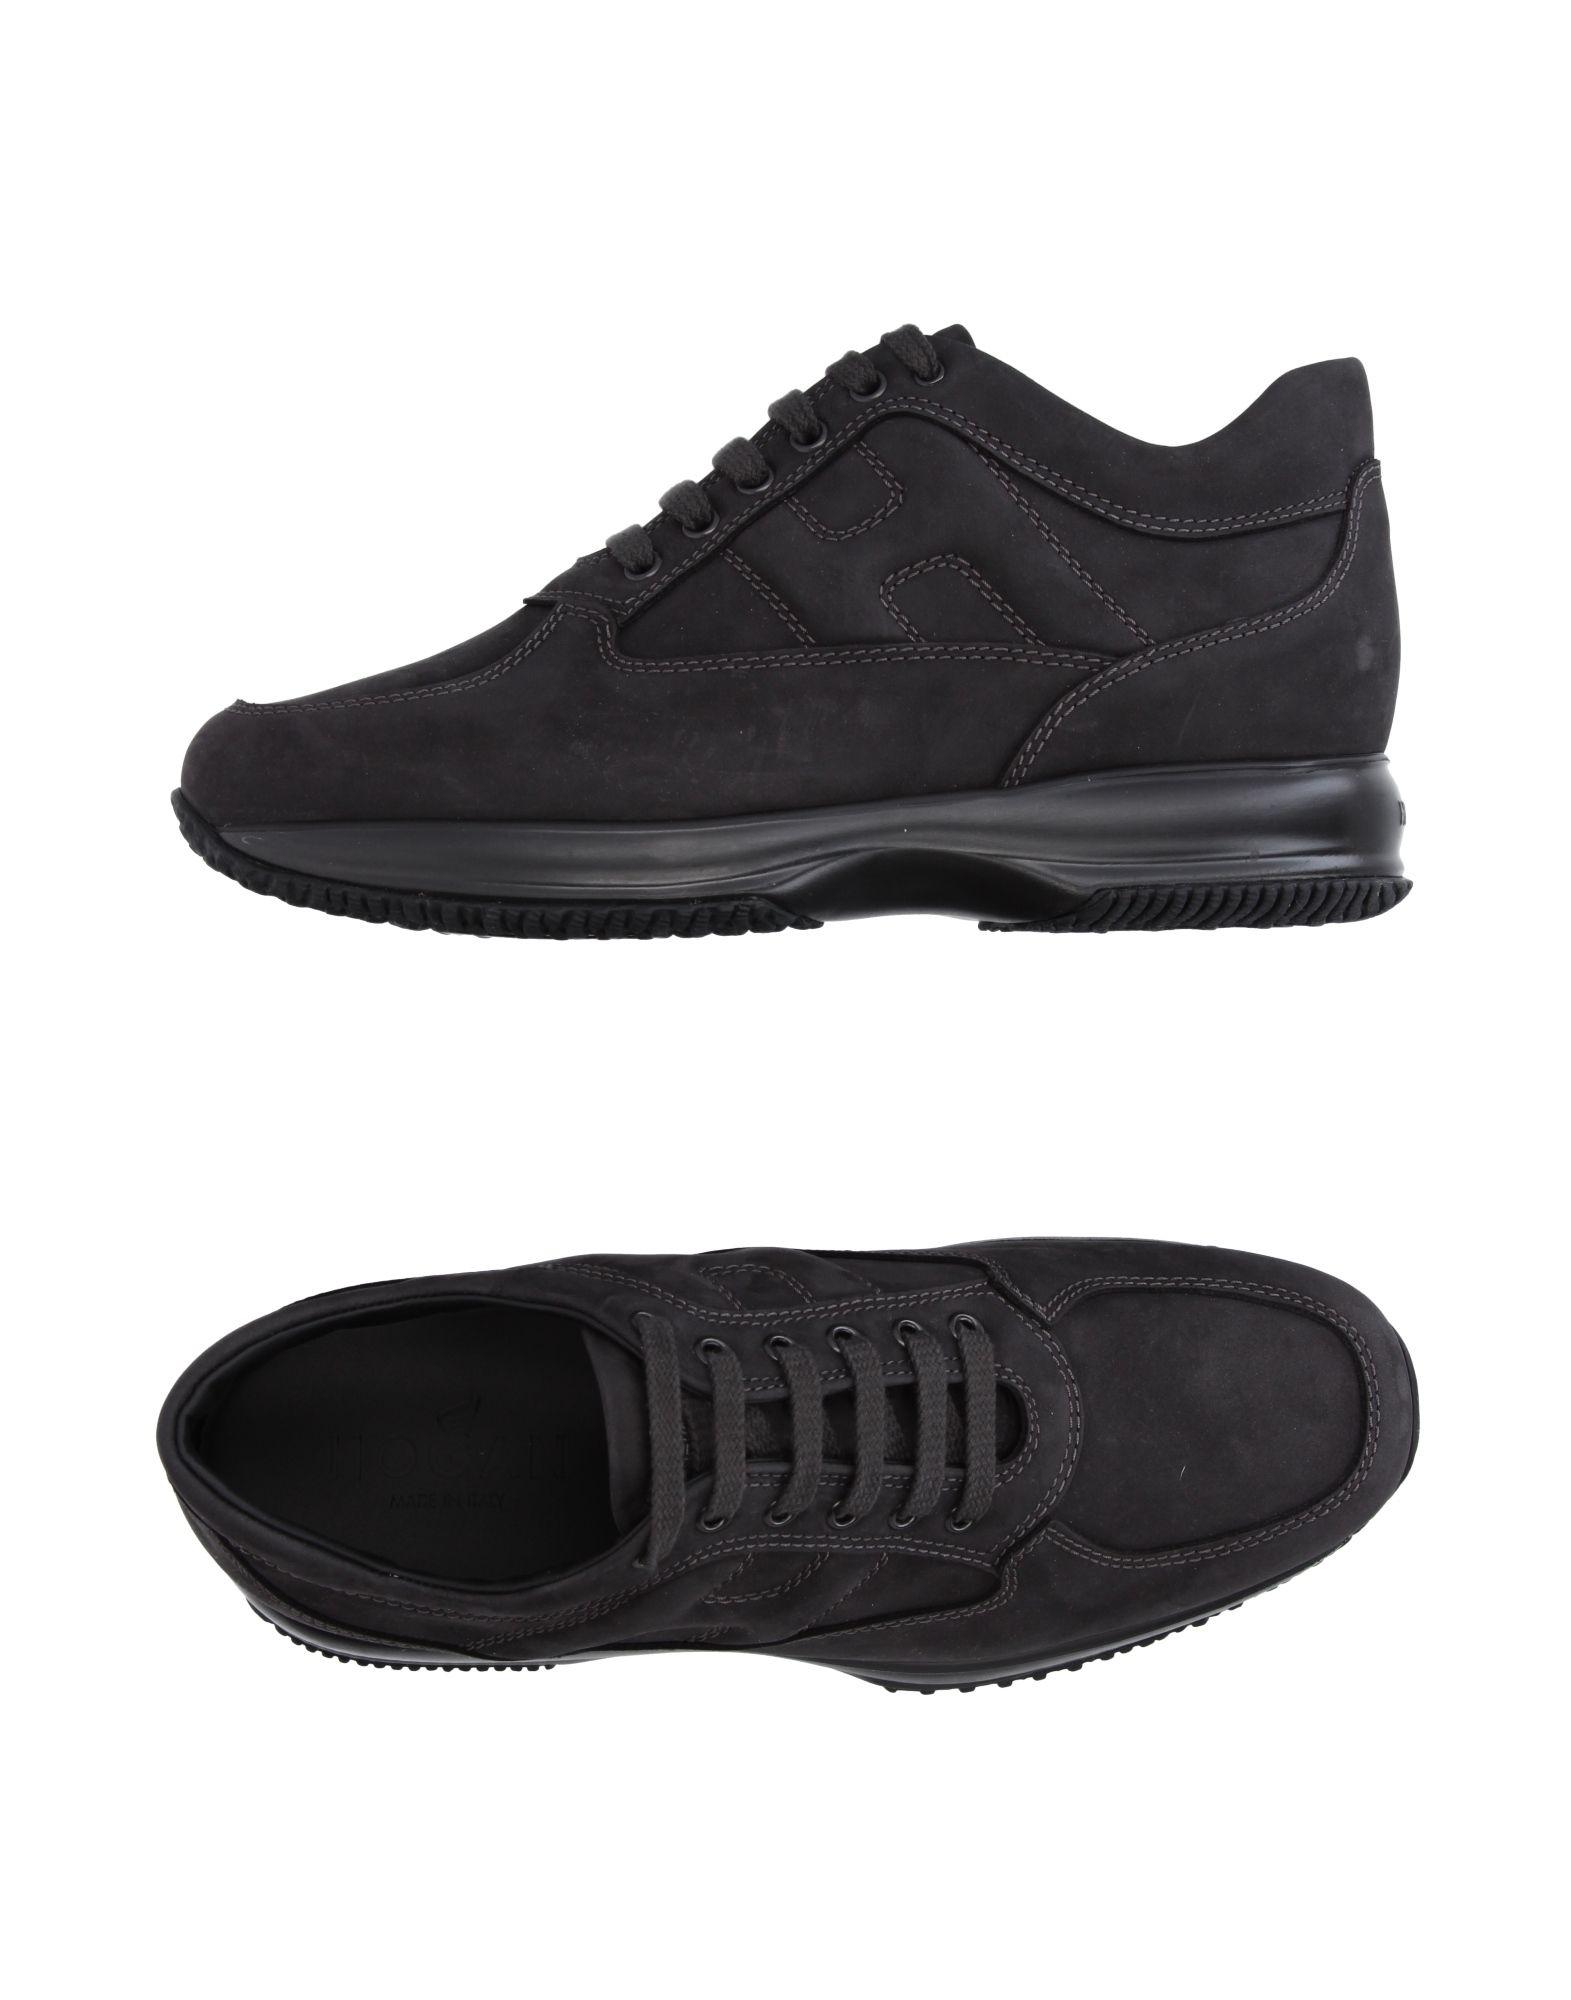 Hogan Sneakers Herren  11217447DA Gute Qualität beliebte Schuhe